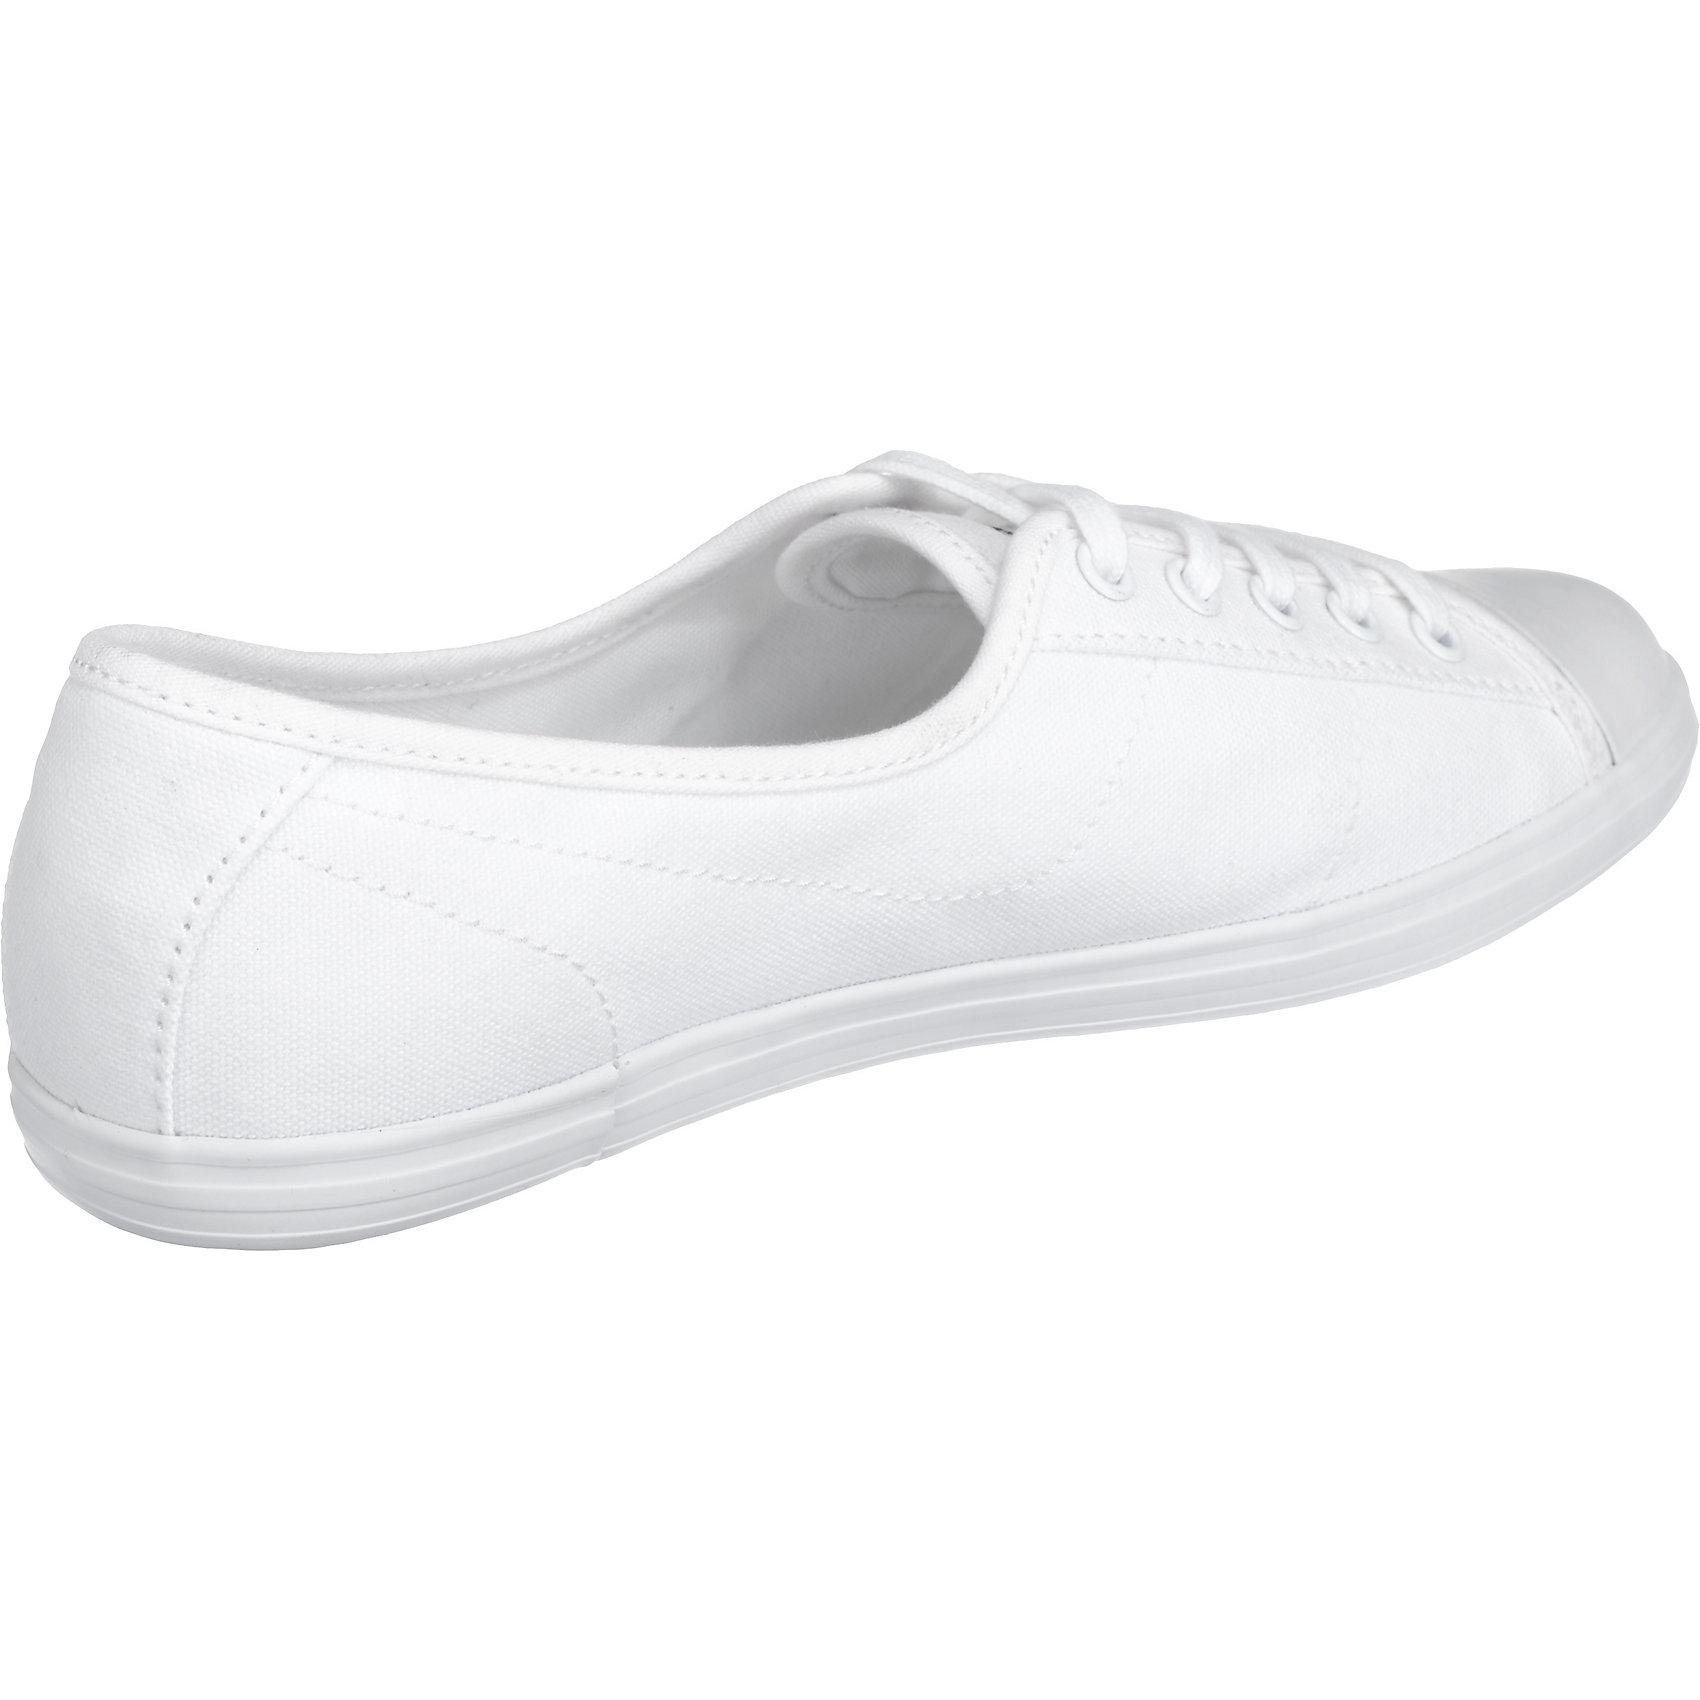 Neu LACOSTE Ziane Bl Sneakers 5765820 für Damen dunkelblau weiß